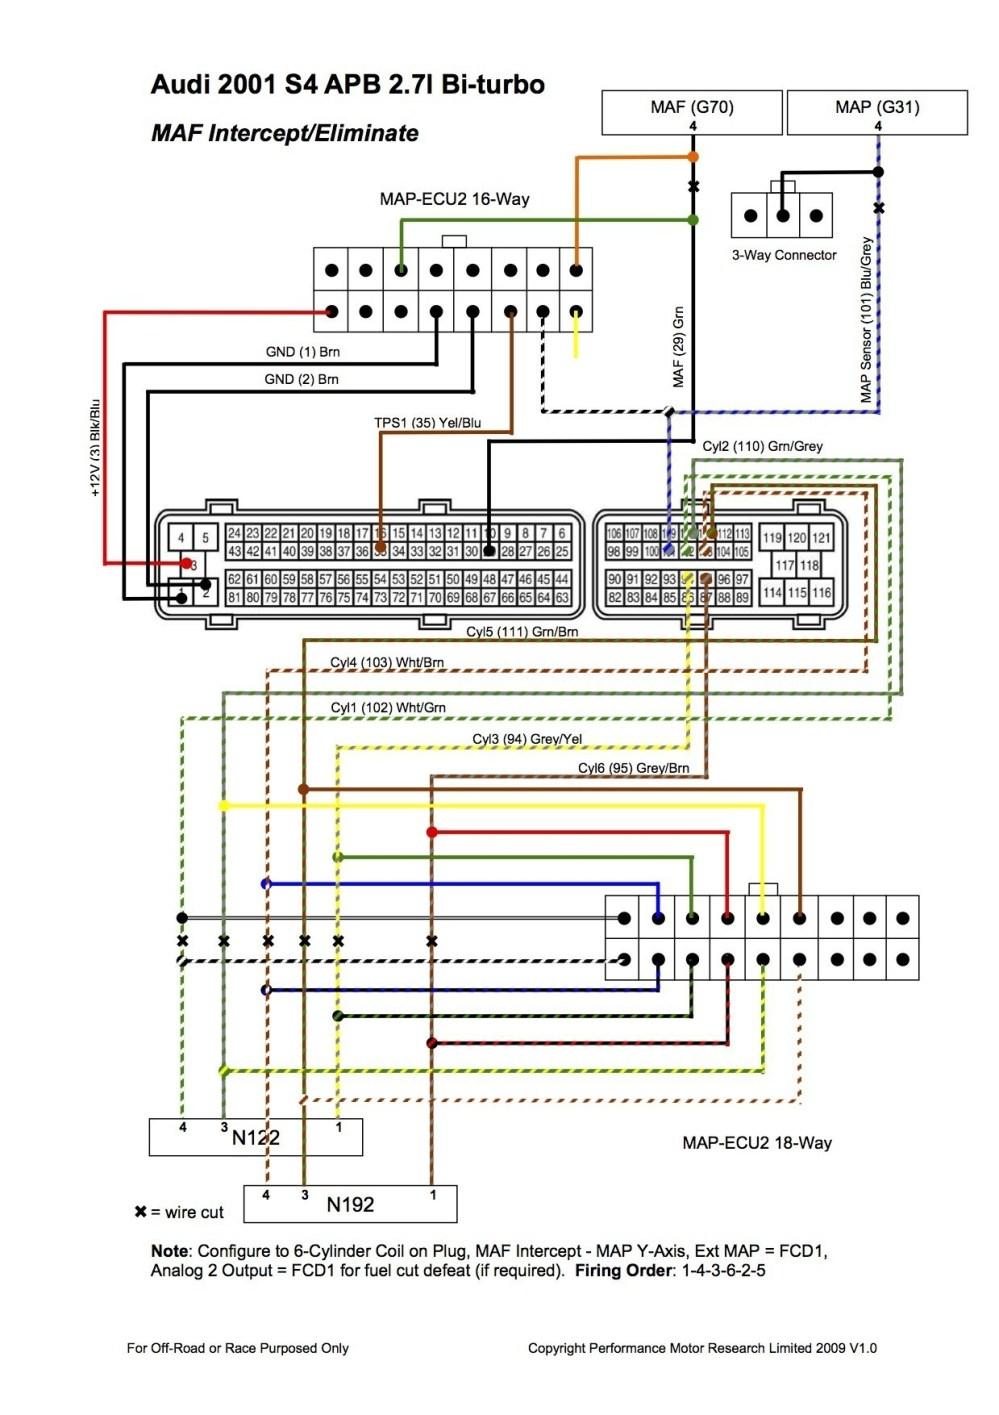 medium resolution of ford 4 9 engine diagram diagram data schemaford 4 9 liter engine diagram wiring diagram m6